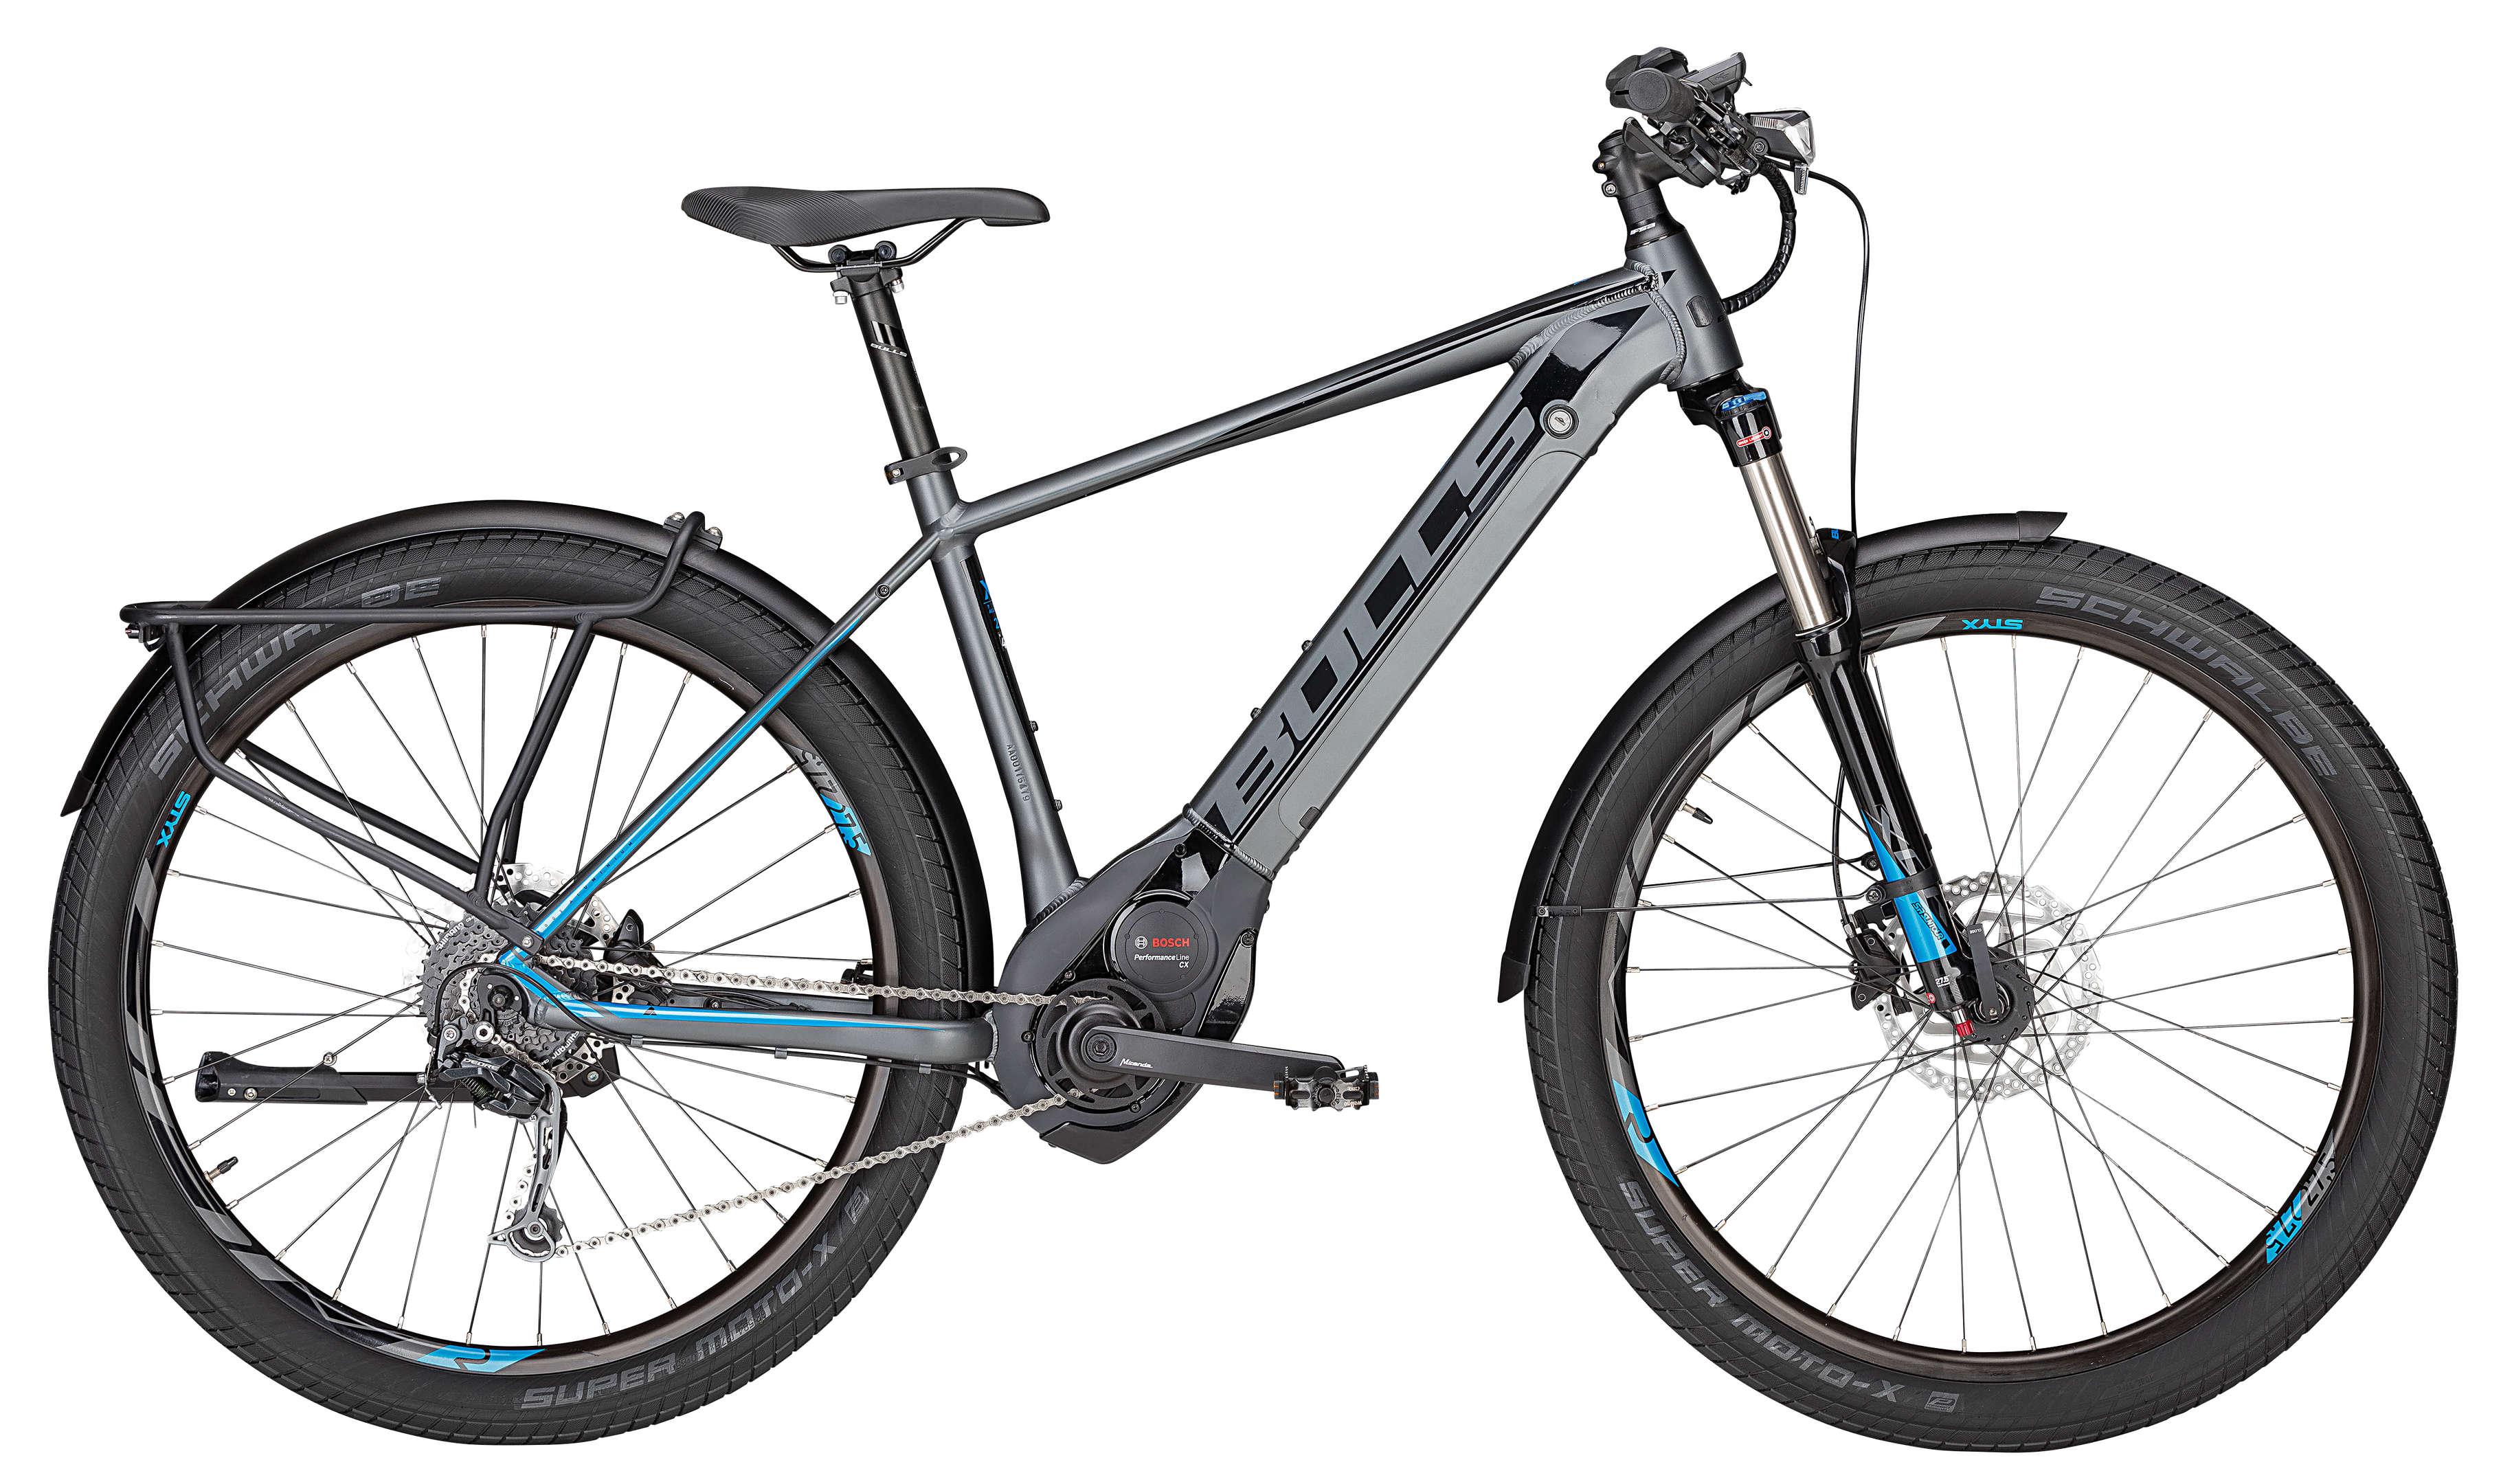 BULLS E-Bike Six50 Evo Street